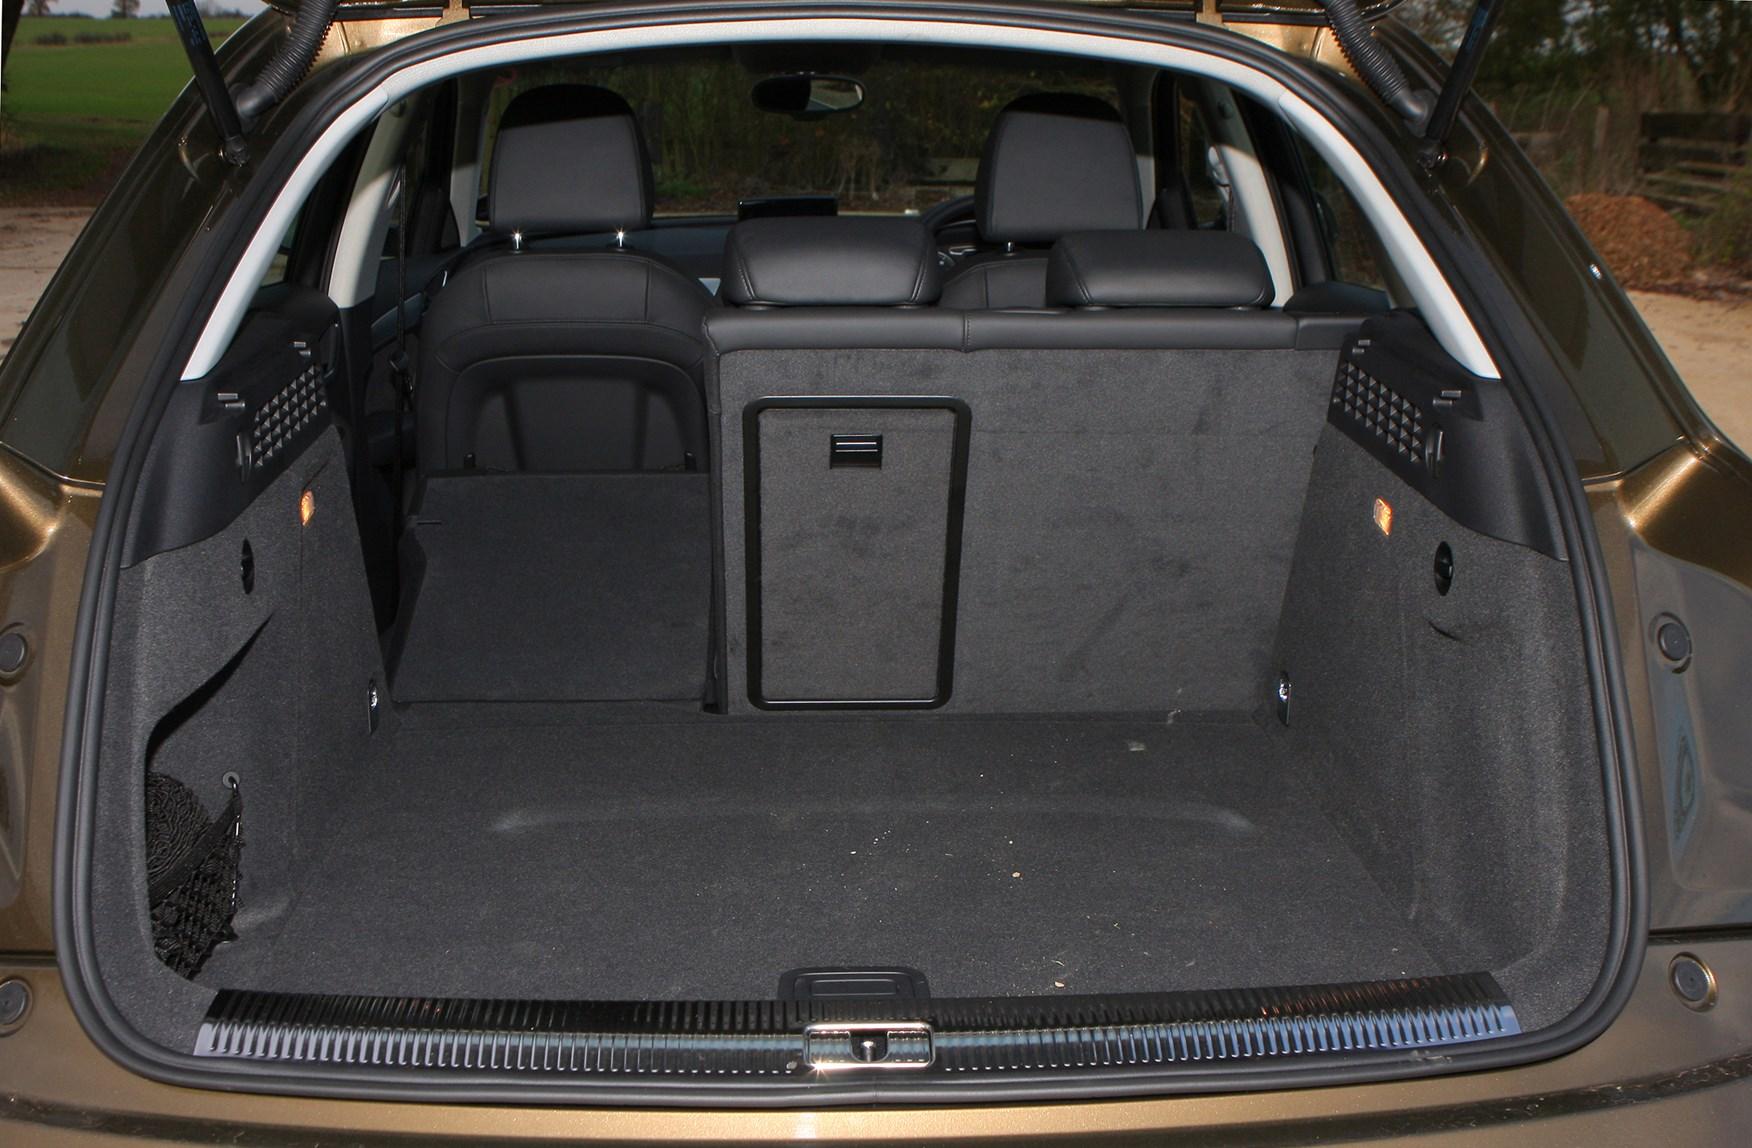 Audi q3 boot space litres